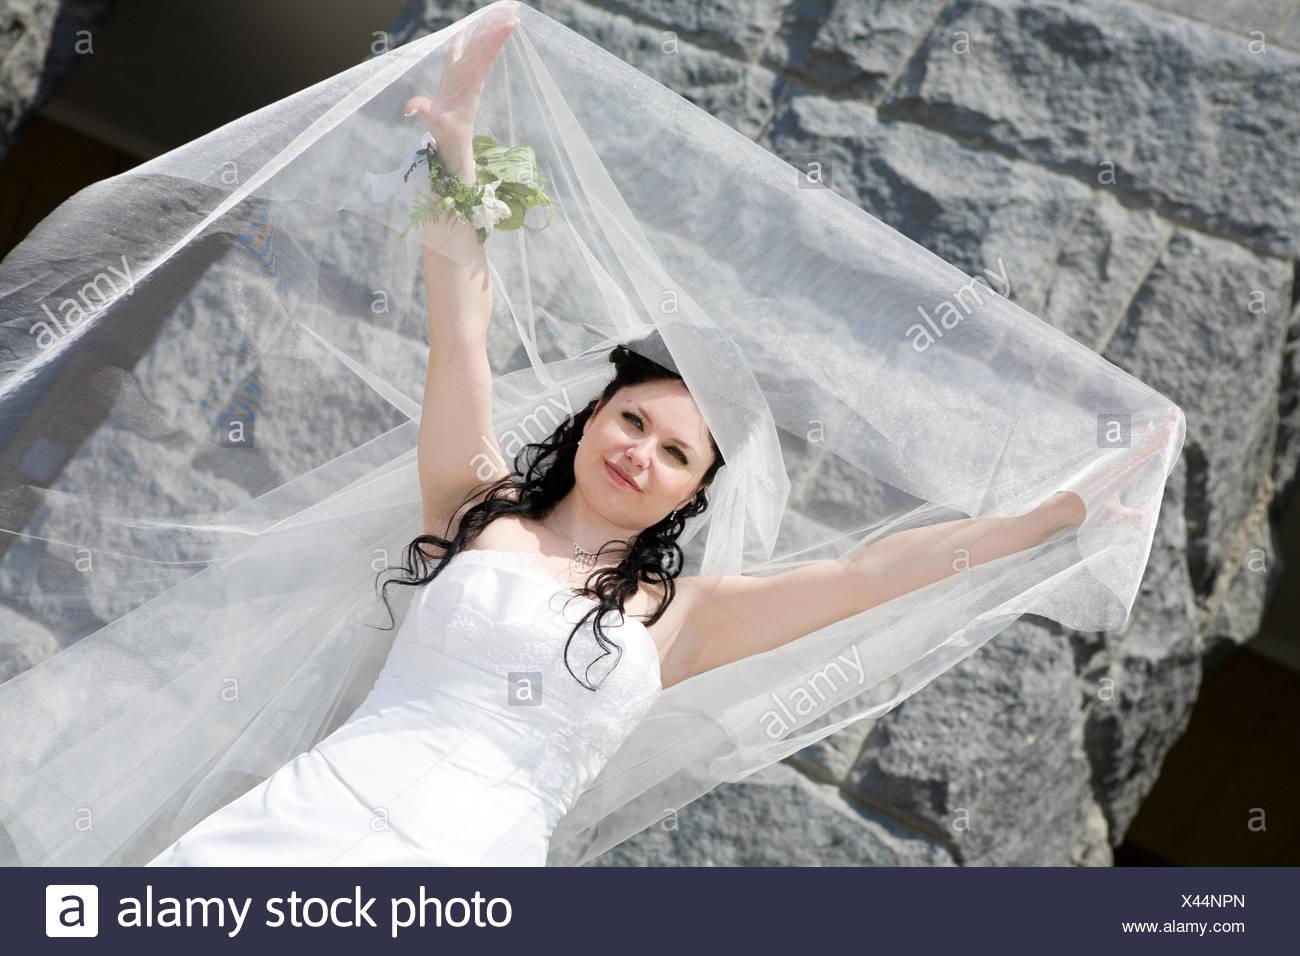 Stone Bride Stockfotos & Stone Bride Bilder - Alamy